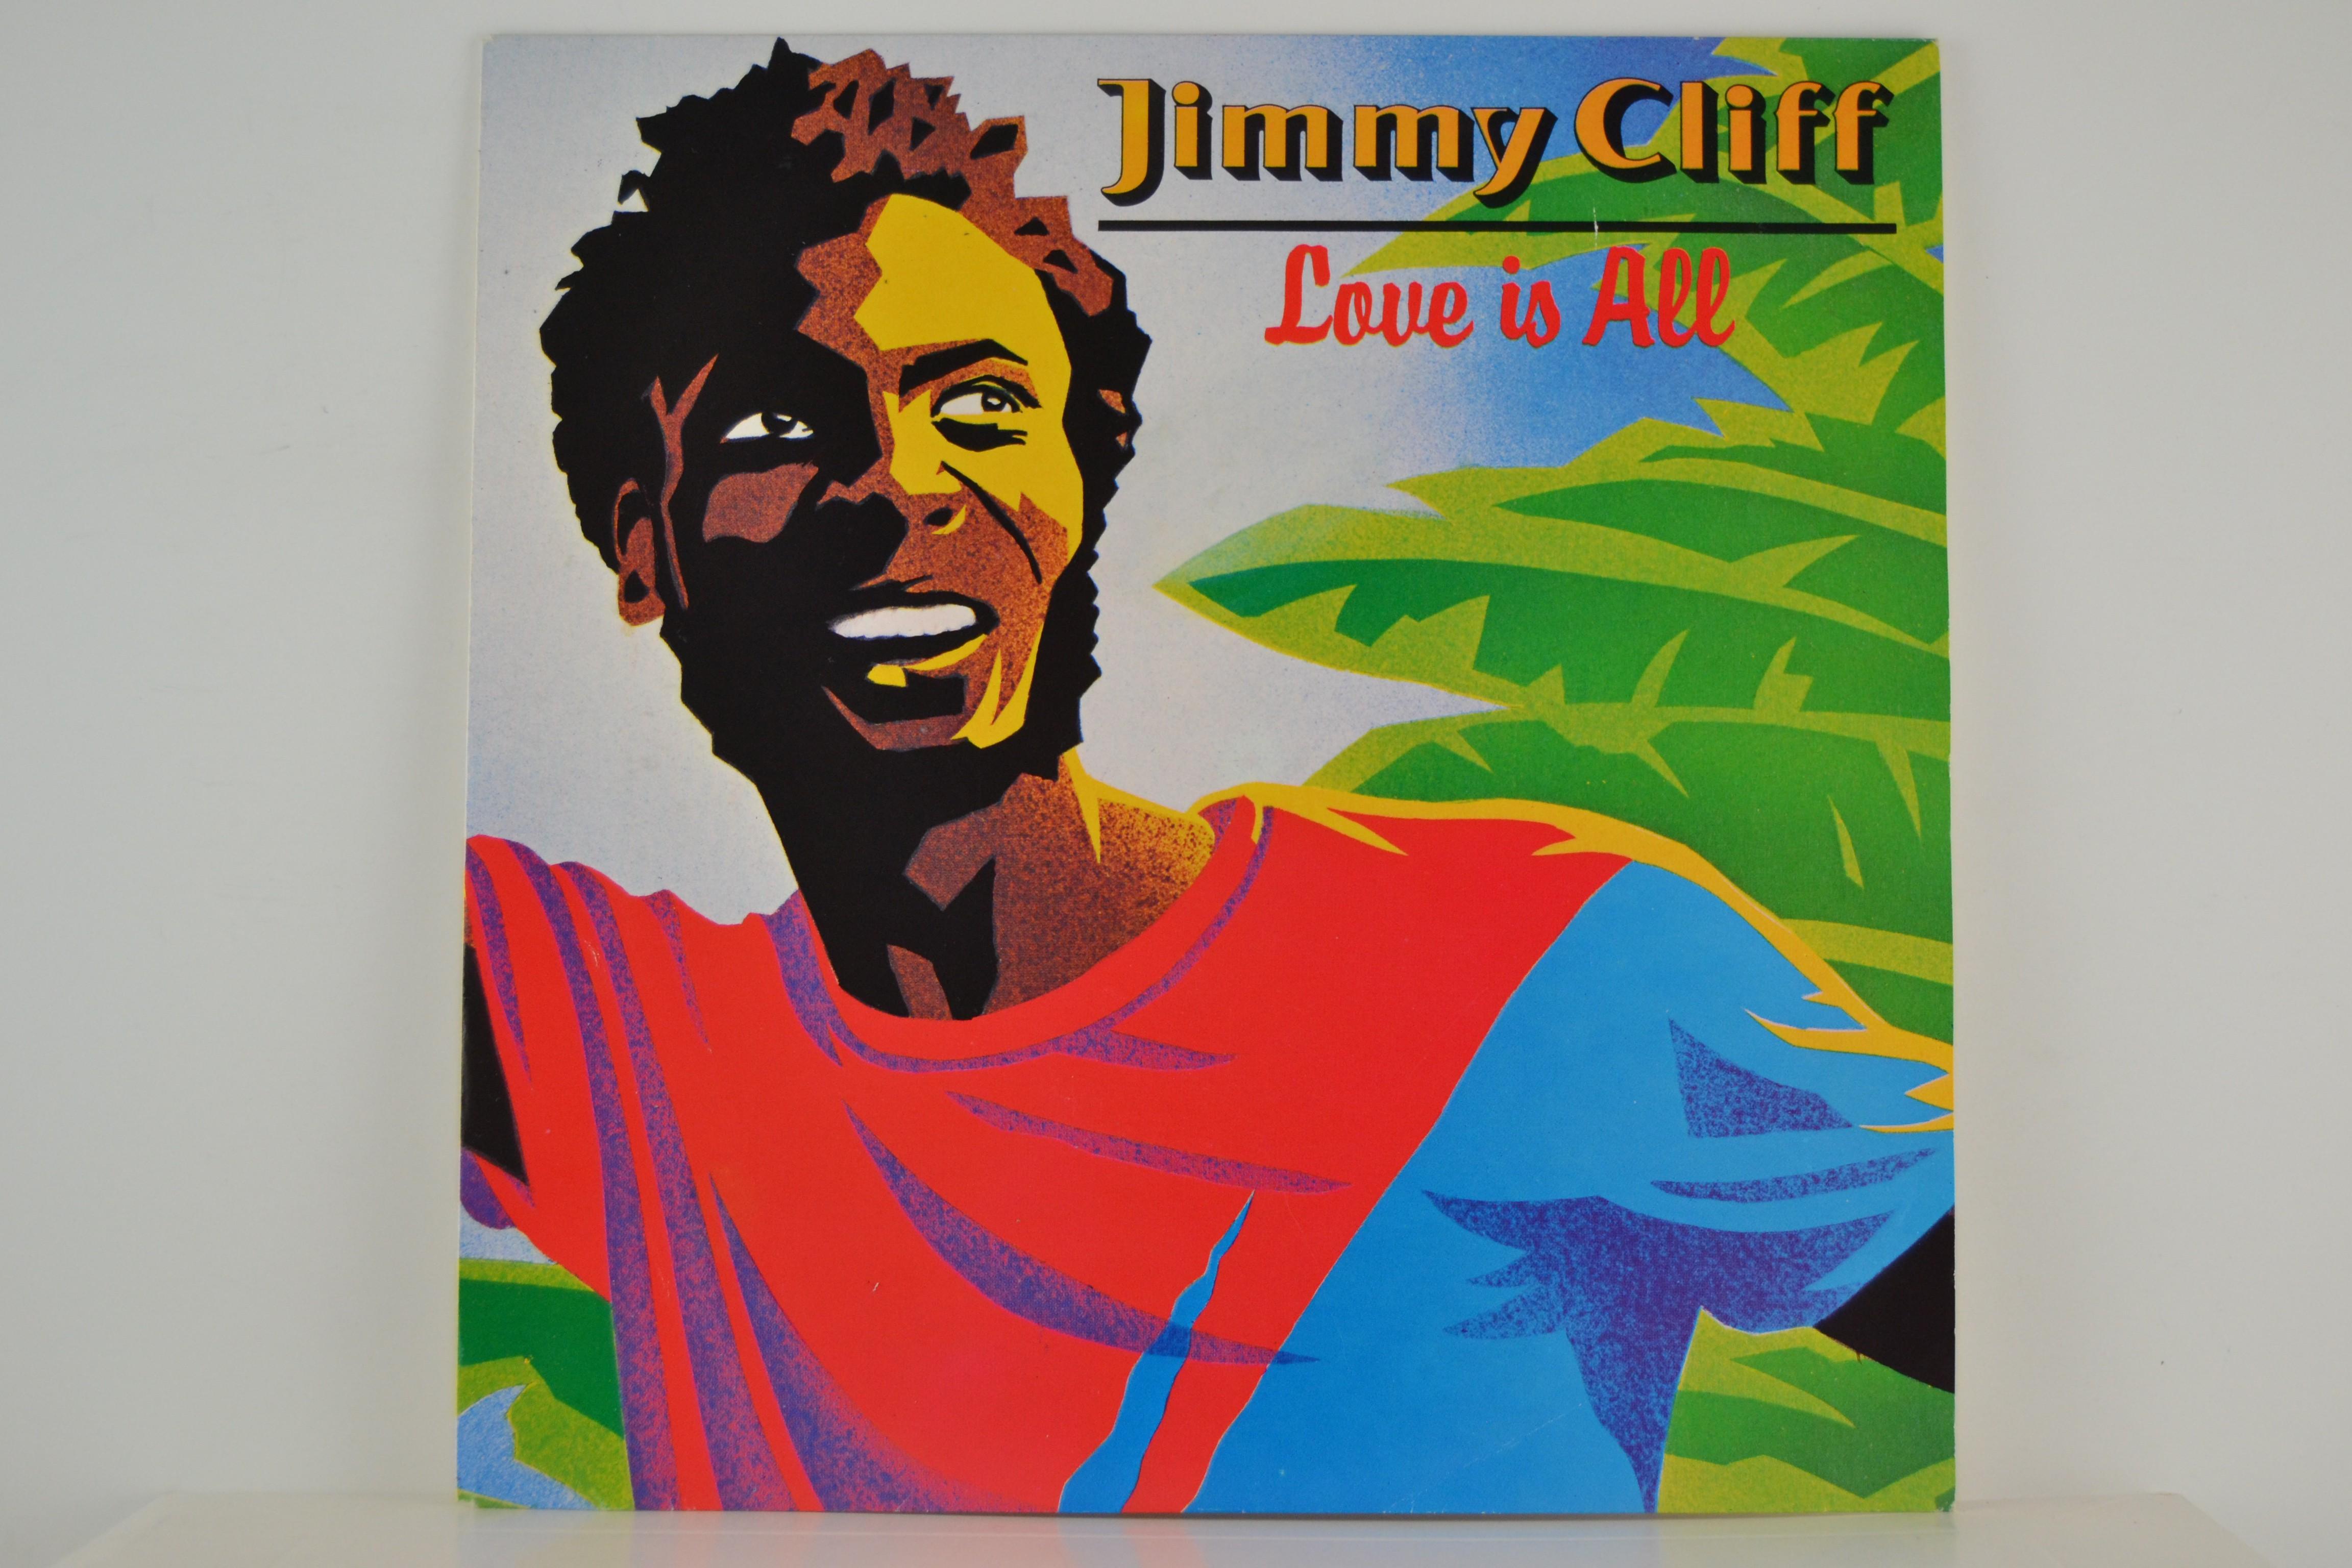 JIMMY CLIFF : Love is all / Rub-a-dub partner